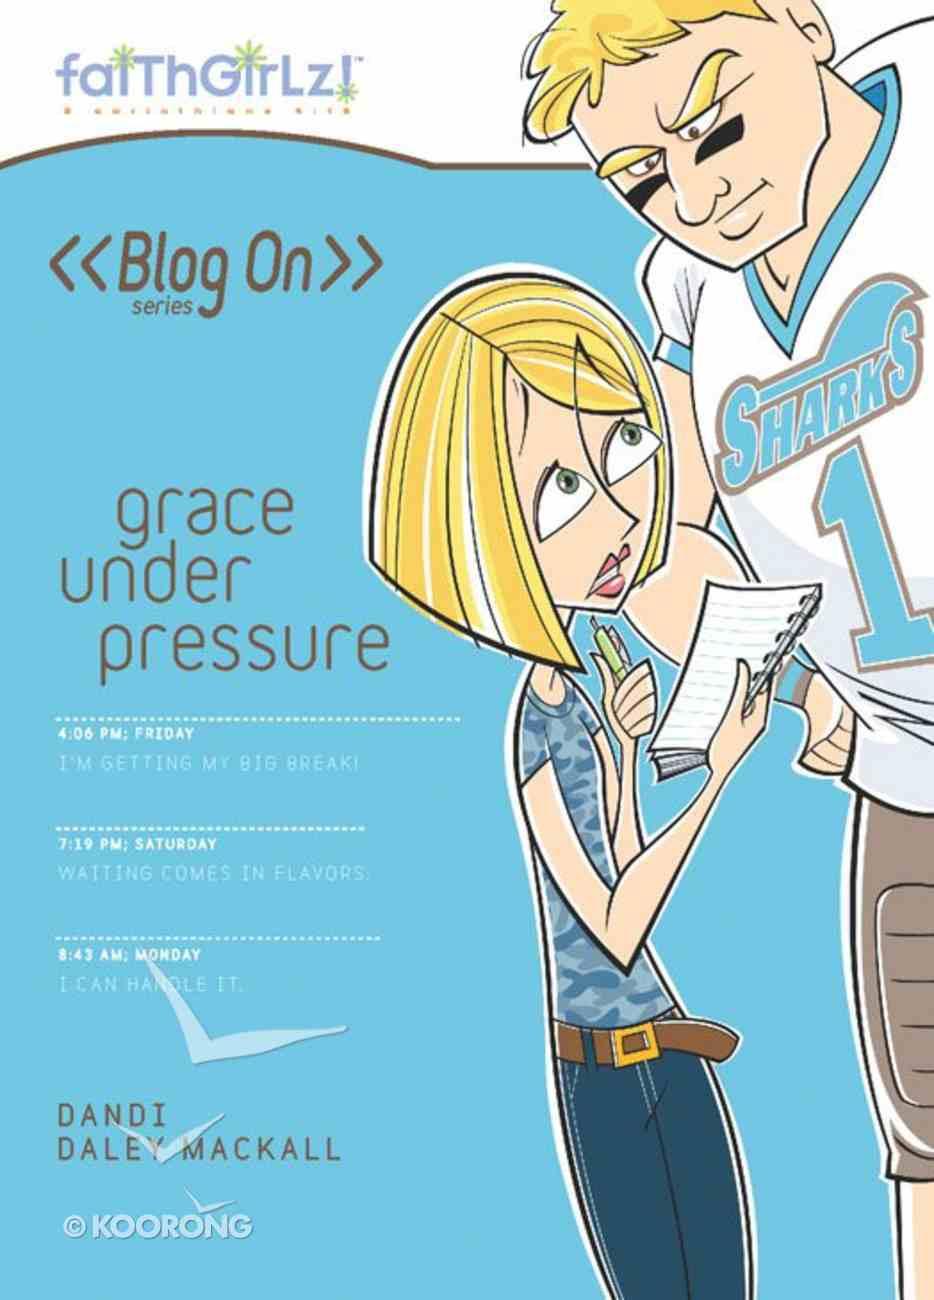 Faithgirlz Blog on #05: Grace Under Pressure (#05 in Faithgirlz Blogon Series) eBook